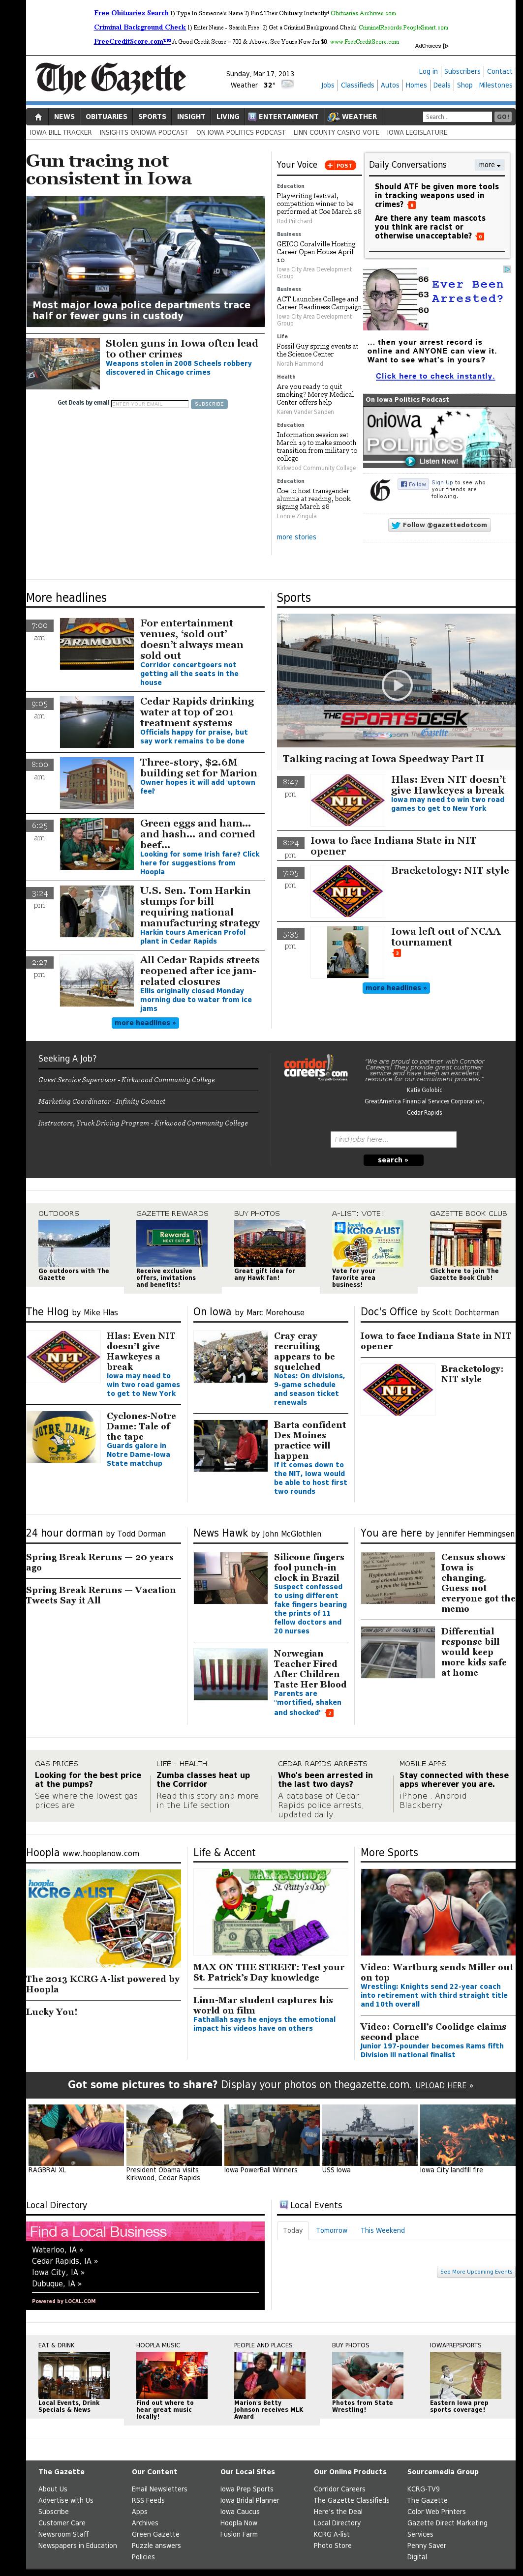 The (Cedar Rapids) Gazette at Monday March 18, 2013, 2:09 a.m. UTC